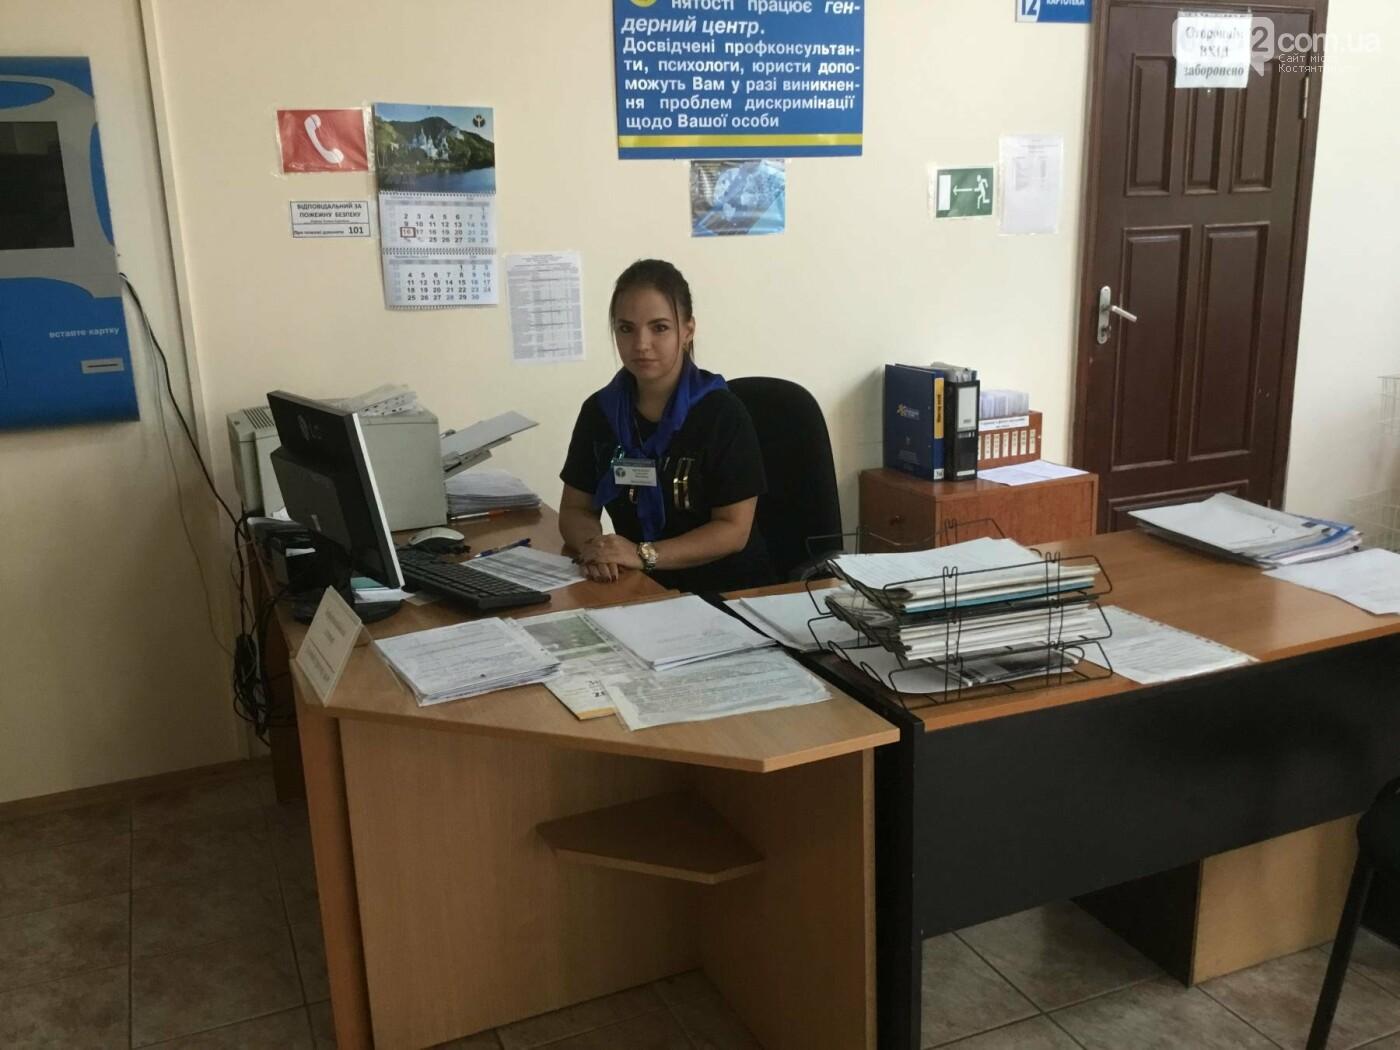 Константиновский центр занятости помогает в трудоустройстве бойцам АТО, фото-1